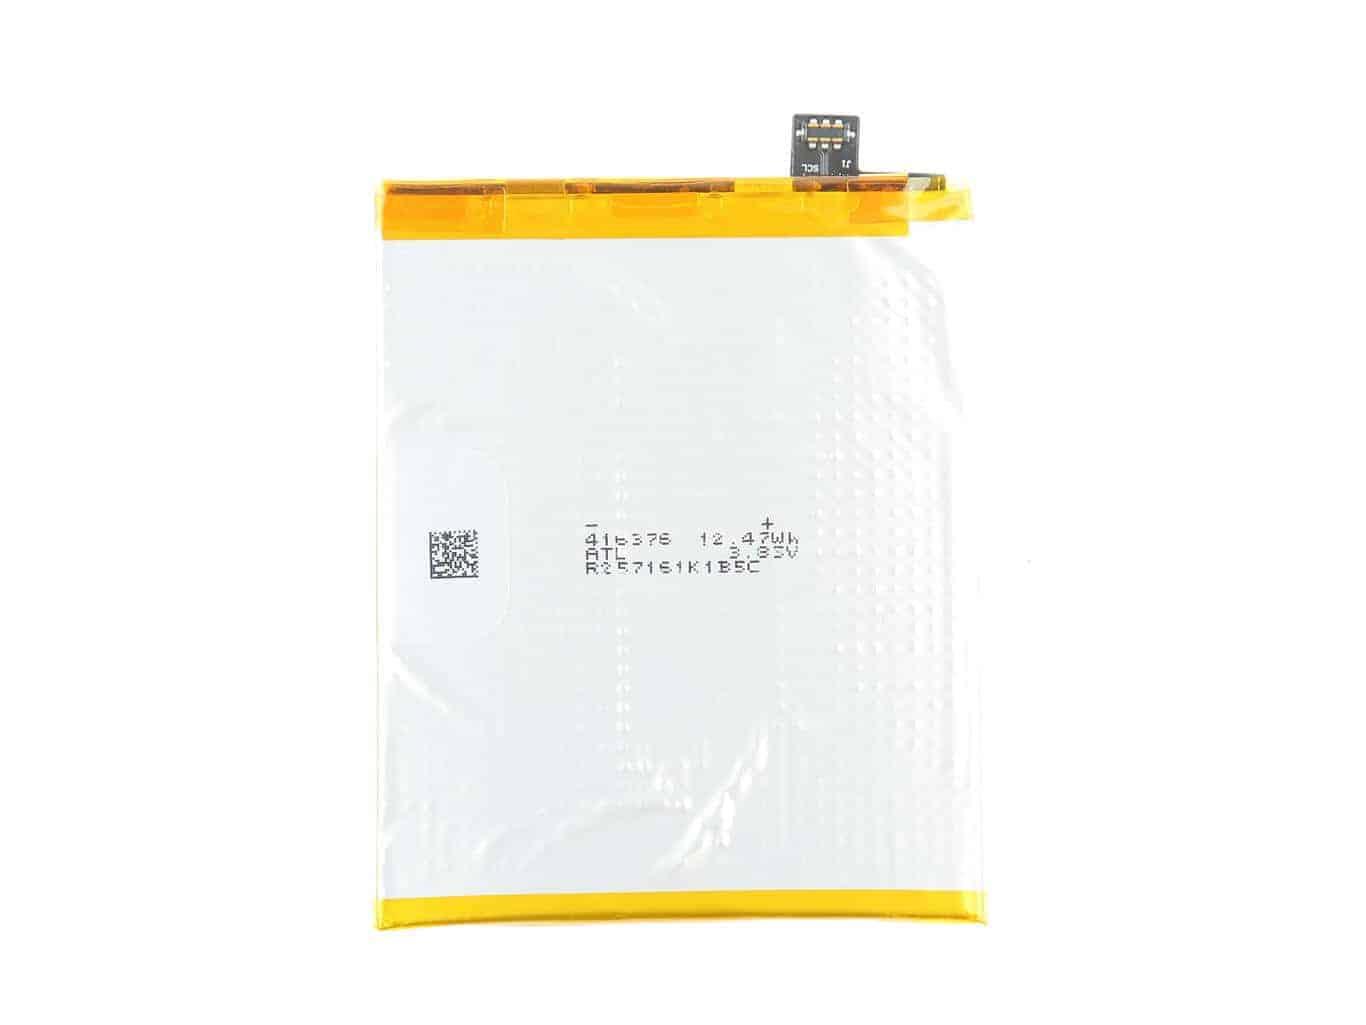 OnePlus 5 Teardown 025